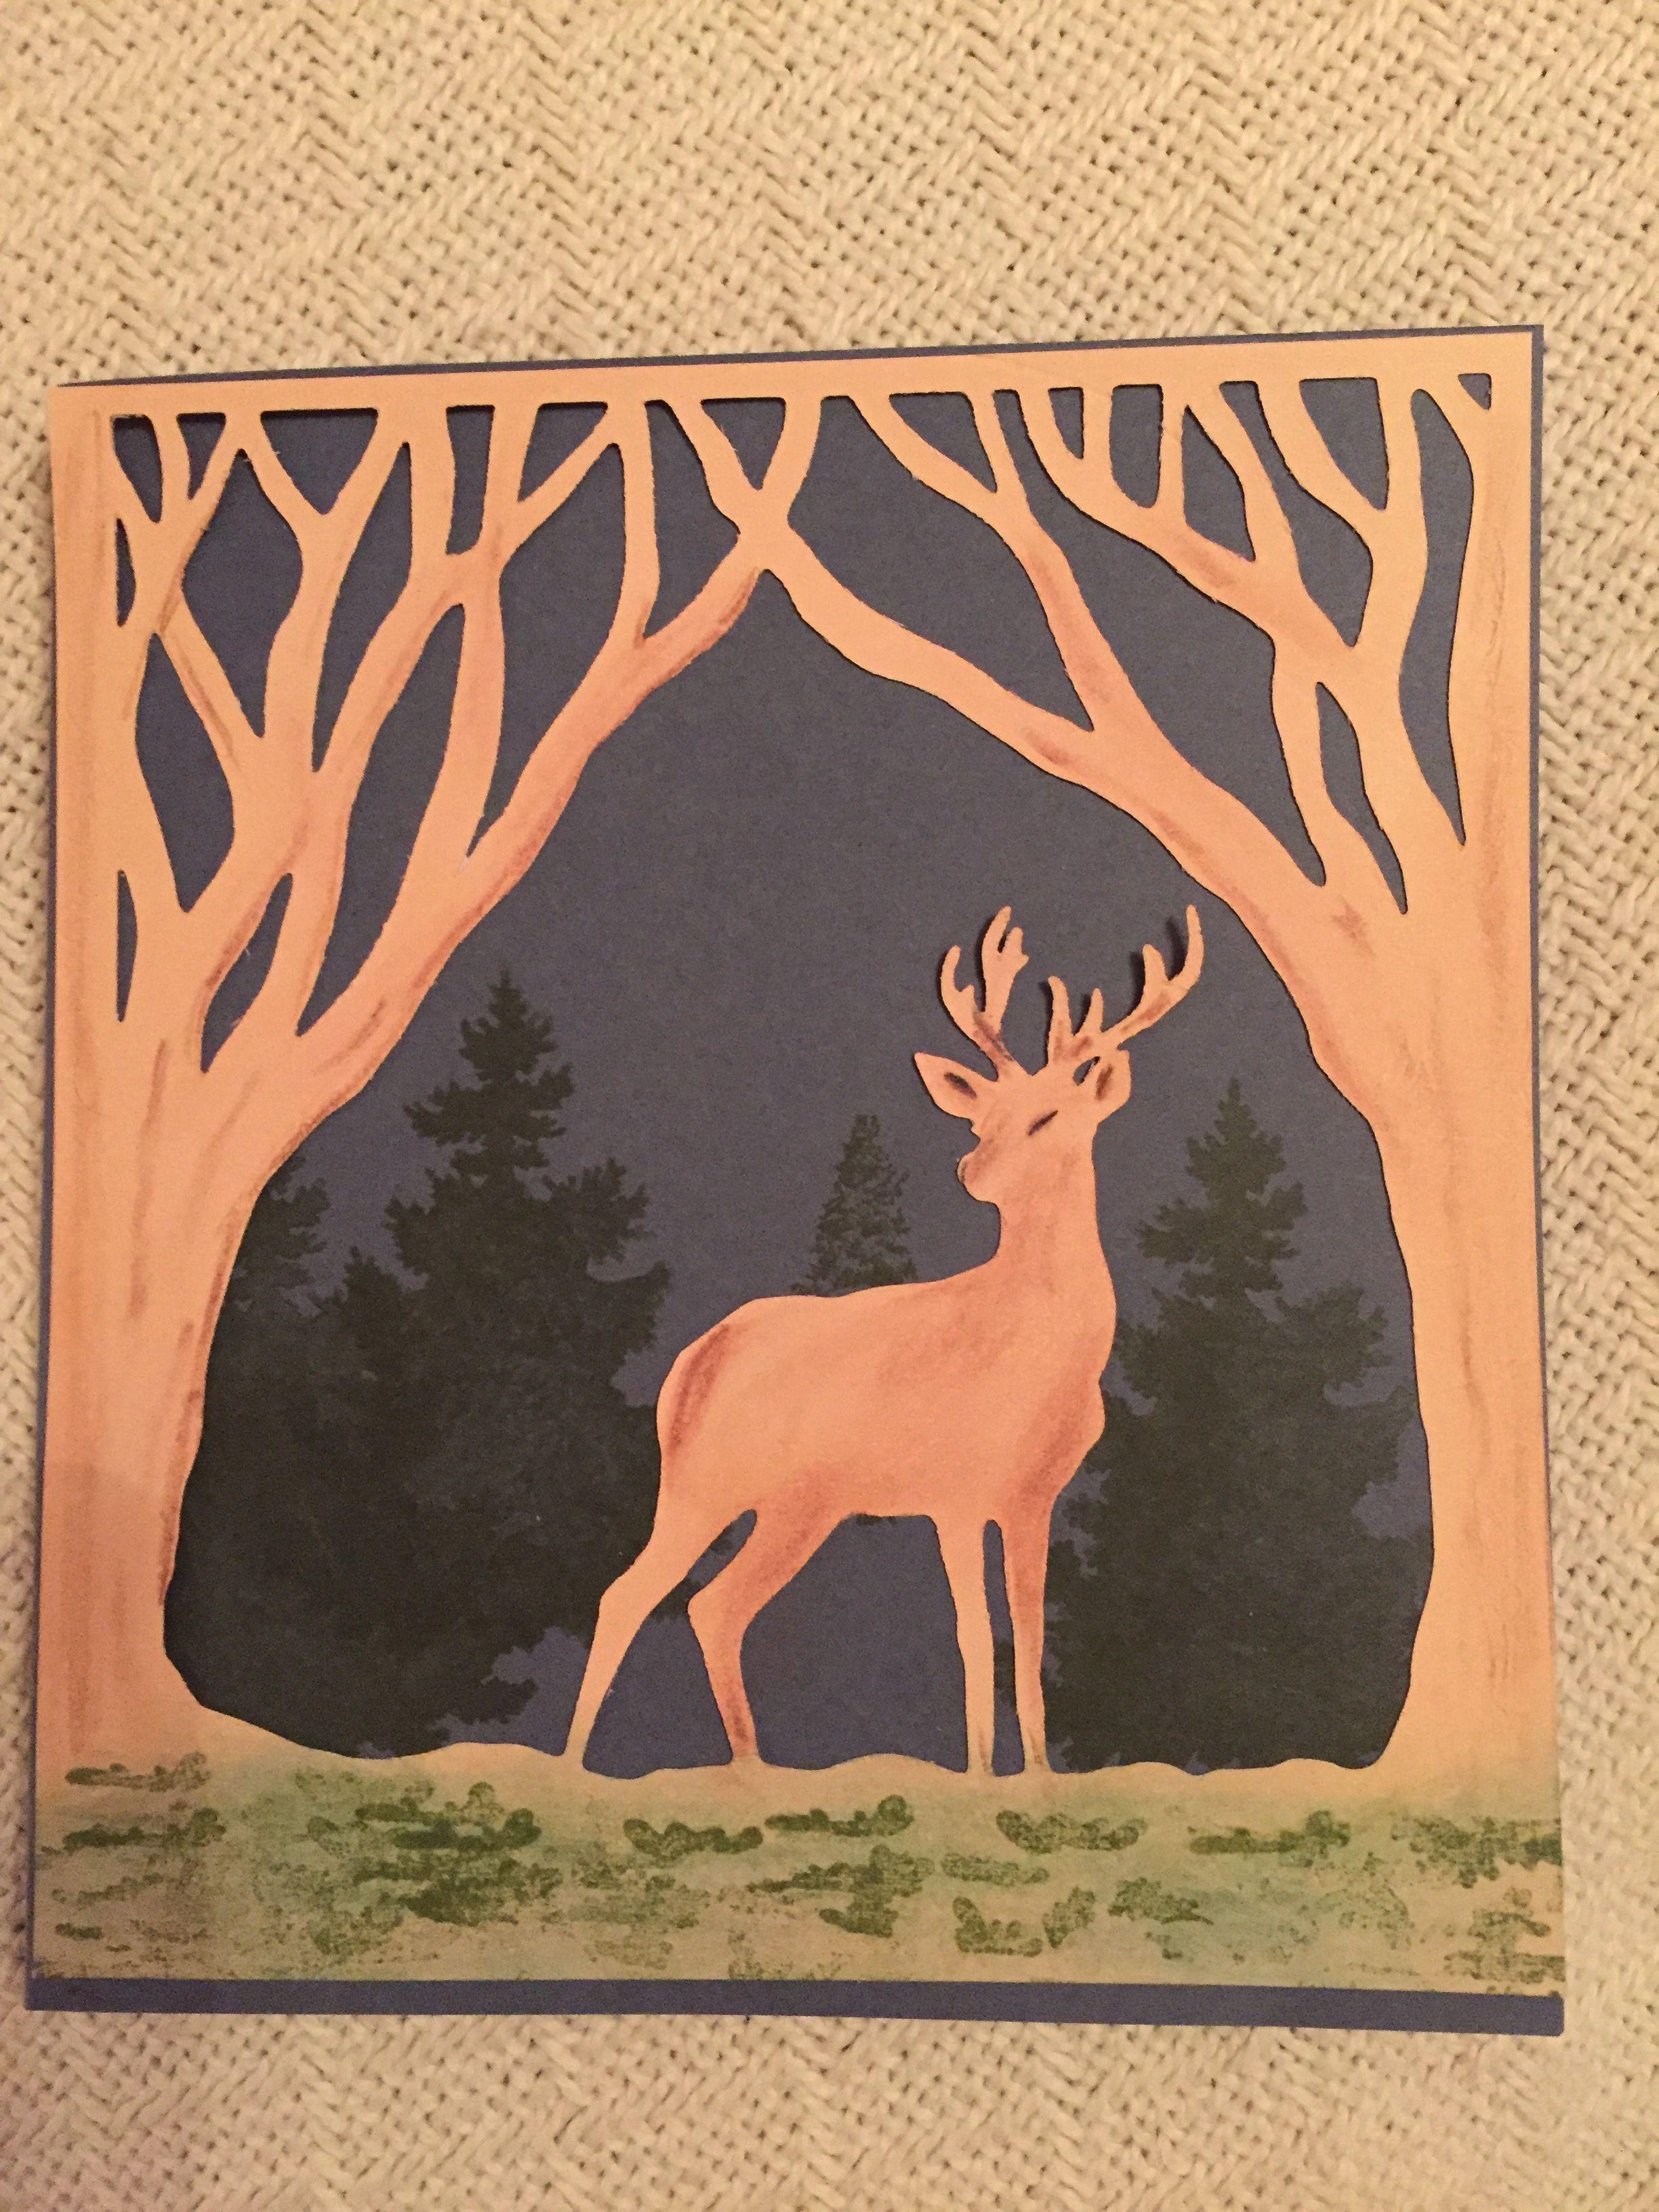 Pin by Debbie Jasany on Cards I like Deer, Art, Moose art